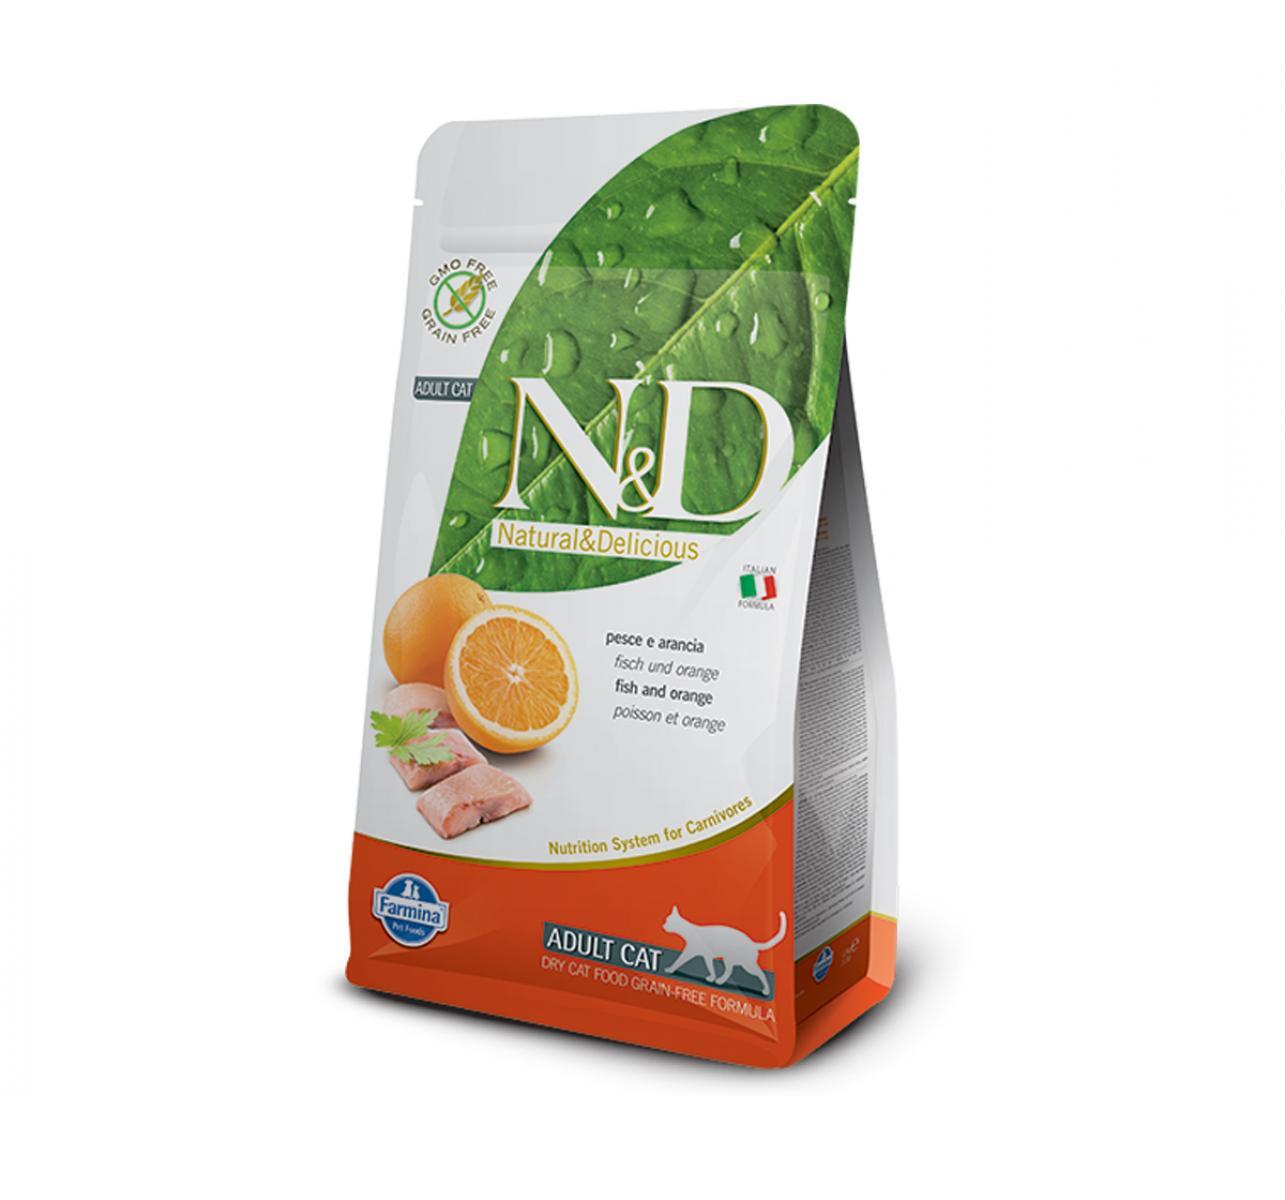 Natural & Delicious Grain Free Fish & Orange Adult Cat - 1.5 Kg